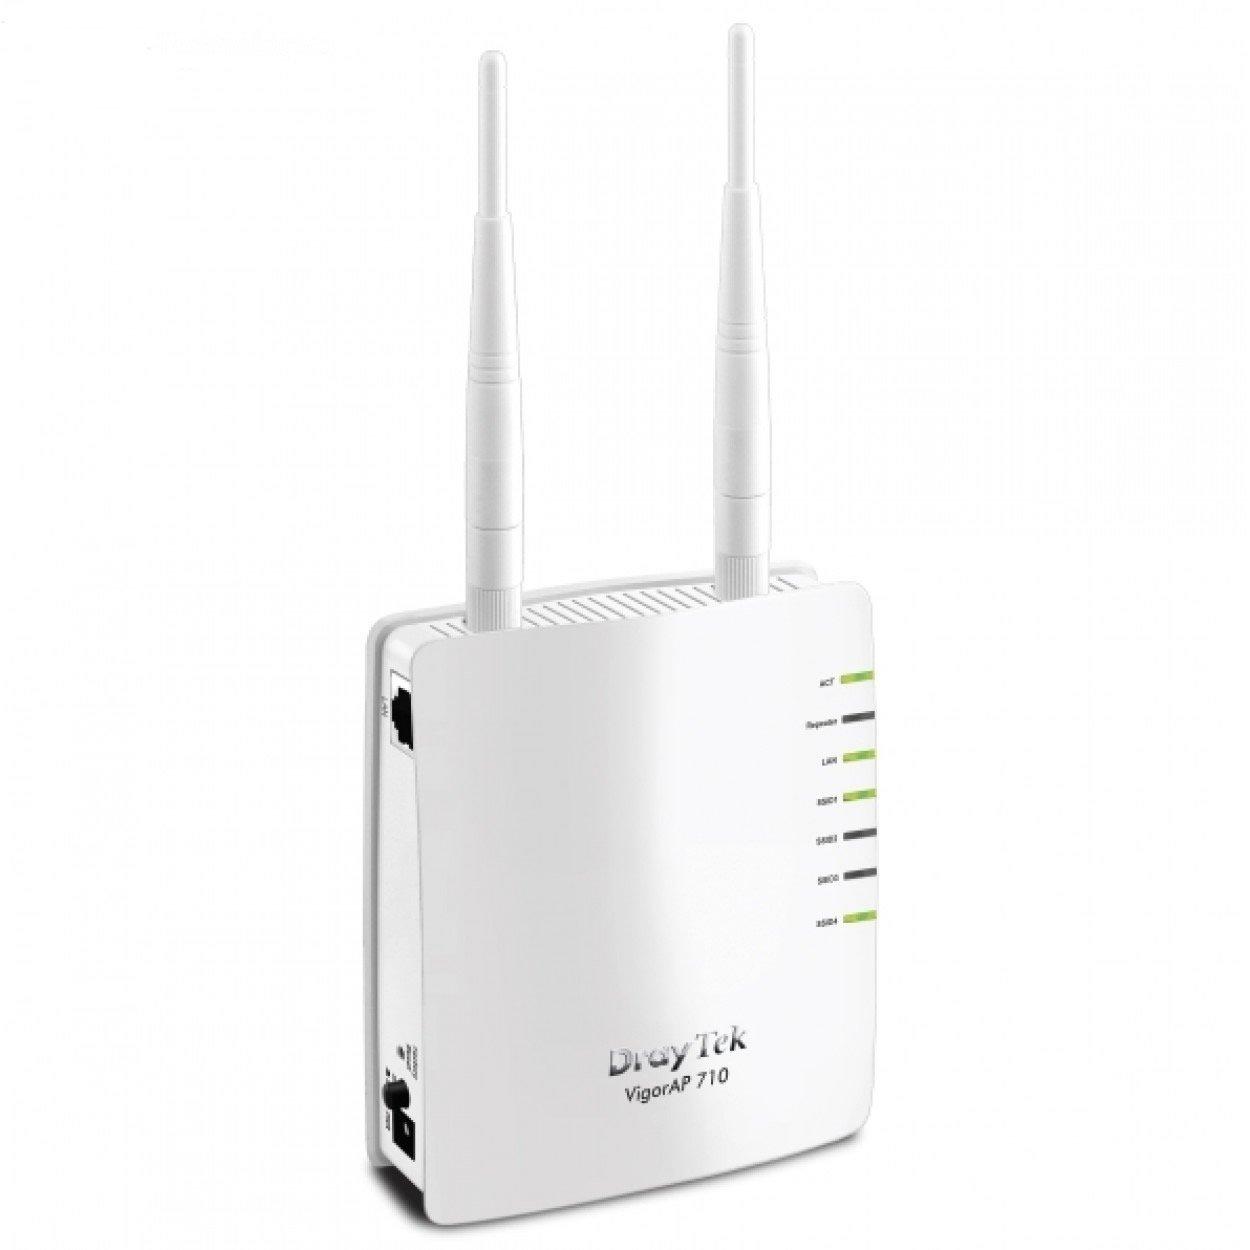 DrayTek AP 710 Wifi Access Point